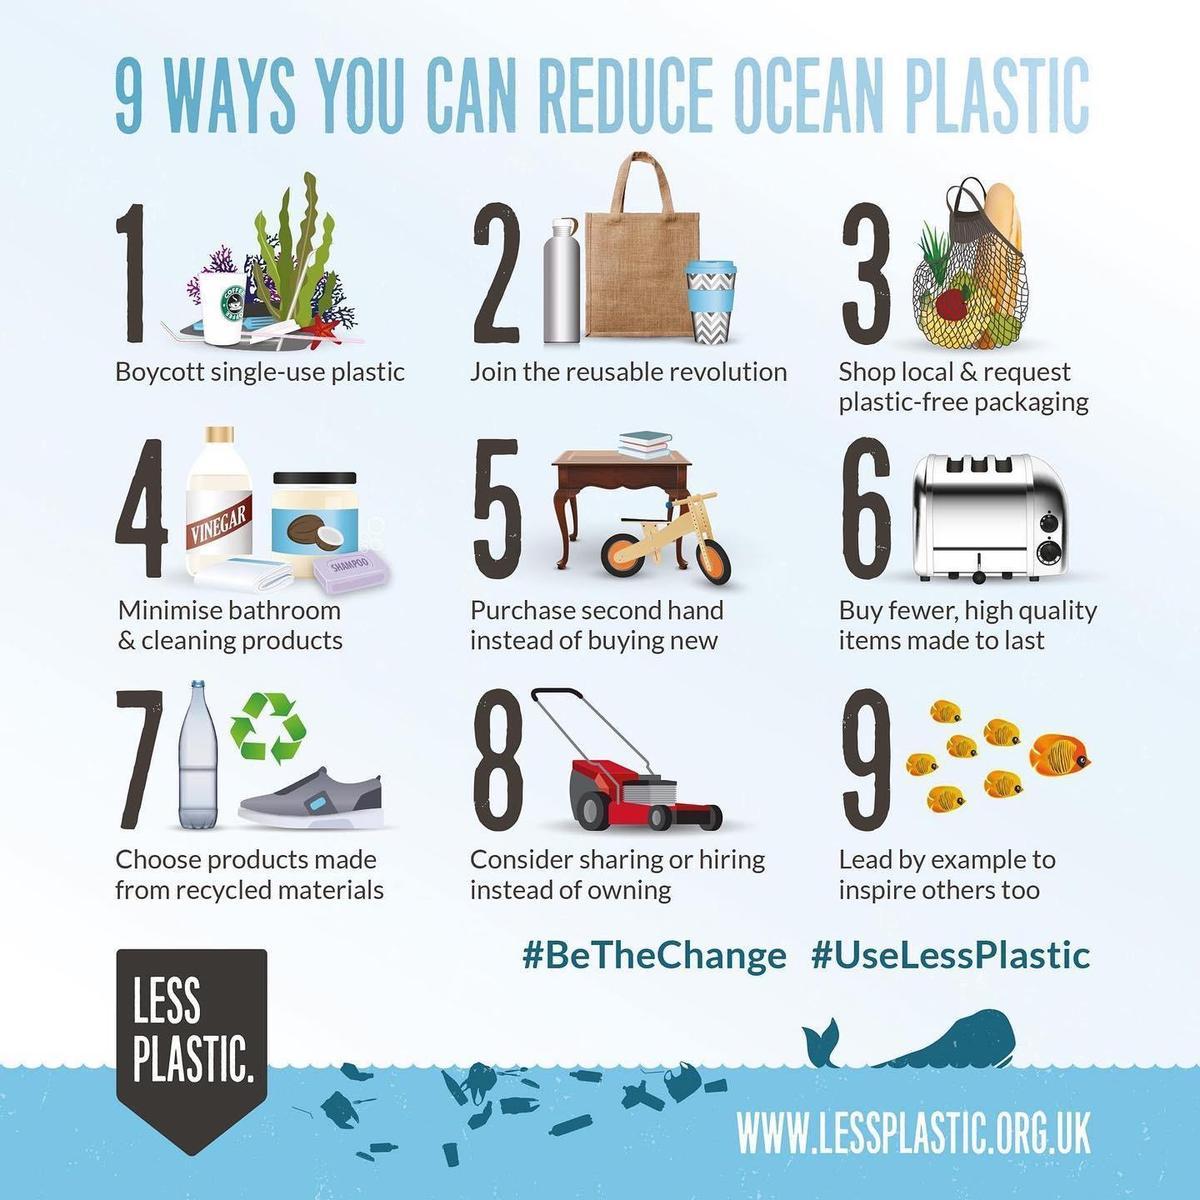 Images to show ways to reduce ocean plastics